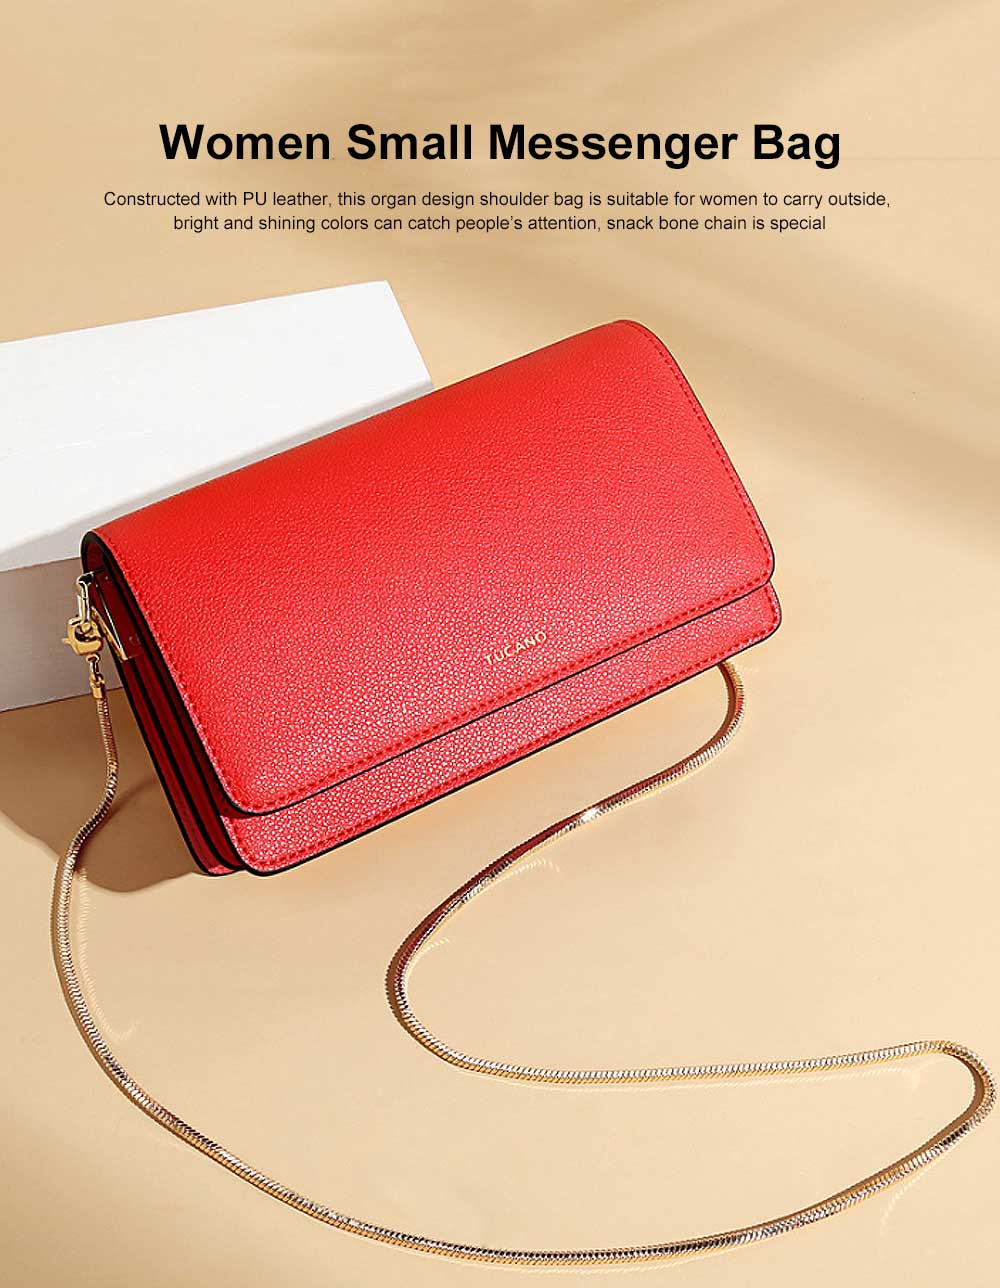 Small Messenger Bags for Women, Crossbody Bag Chain Shoulder Evening Clutch Purse Formal Bag 0